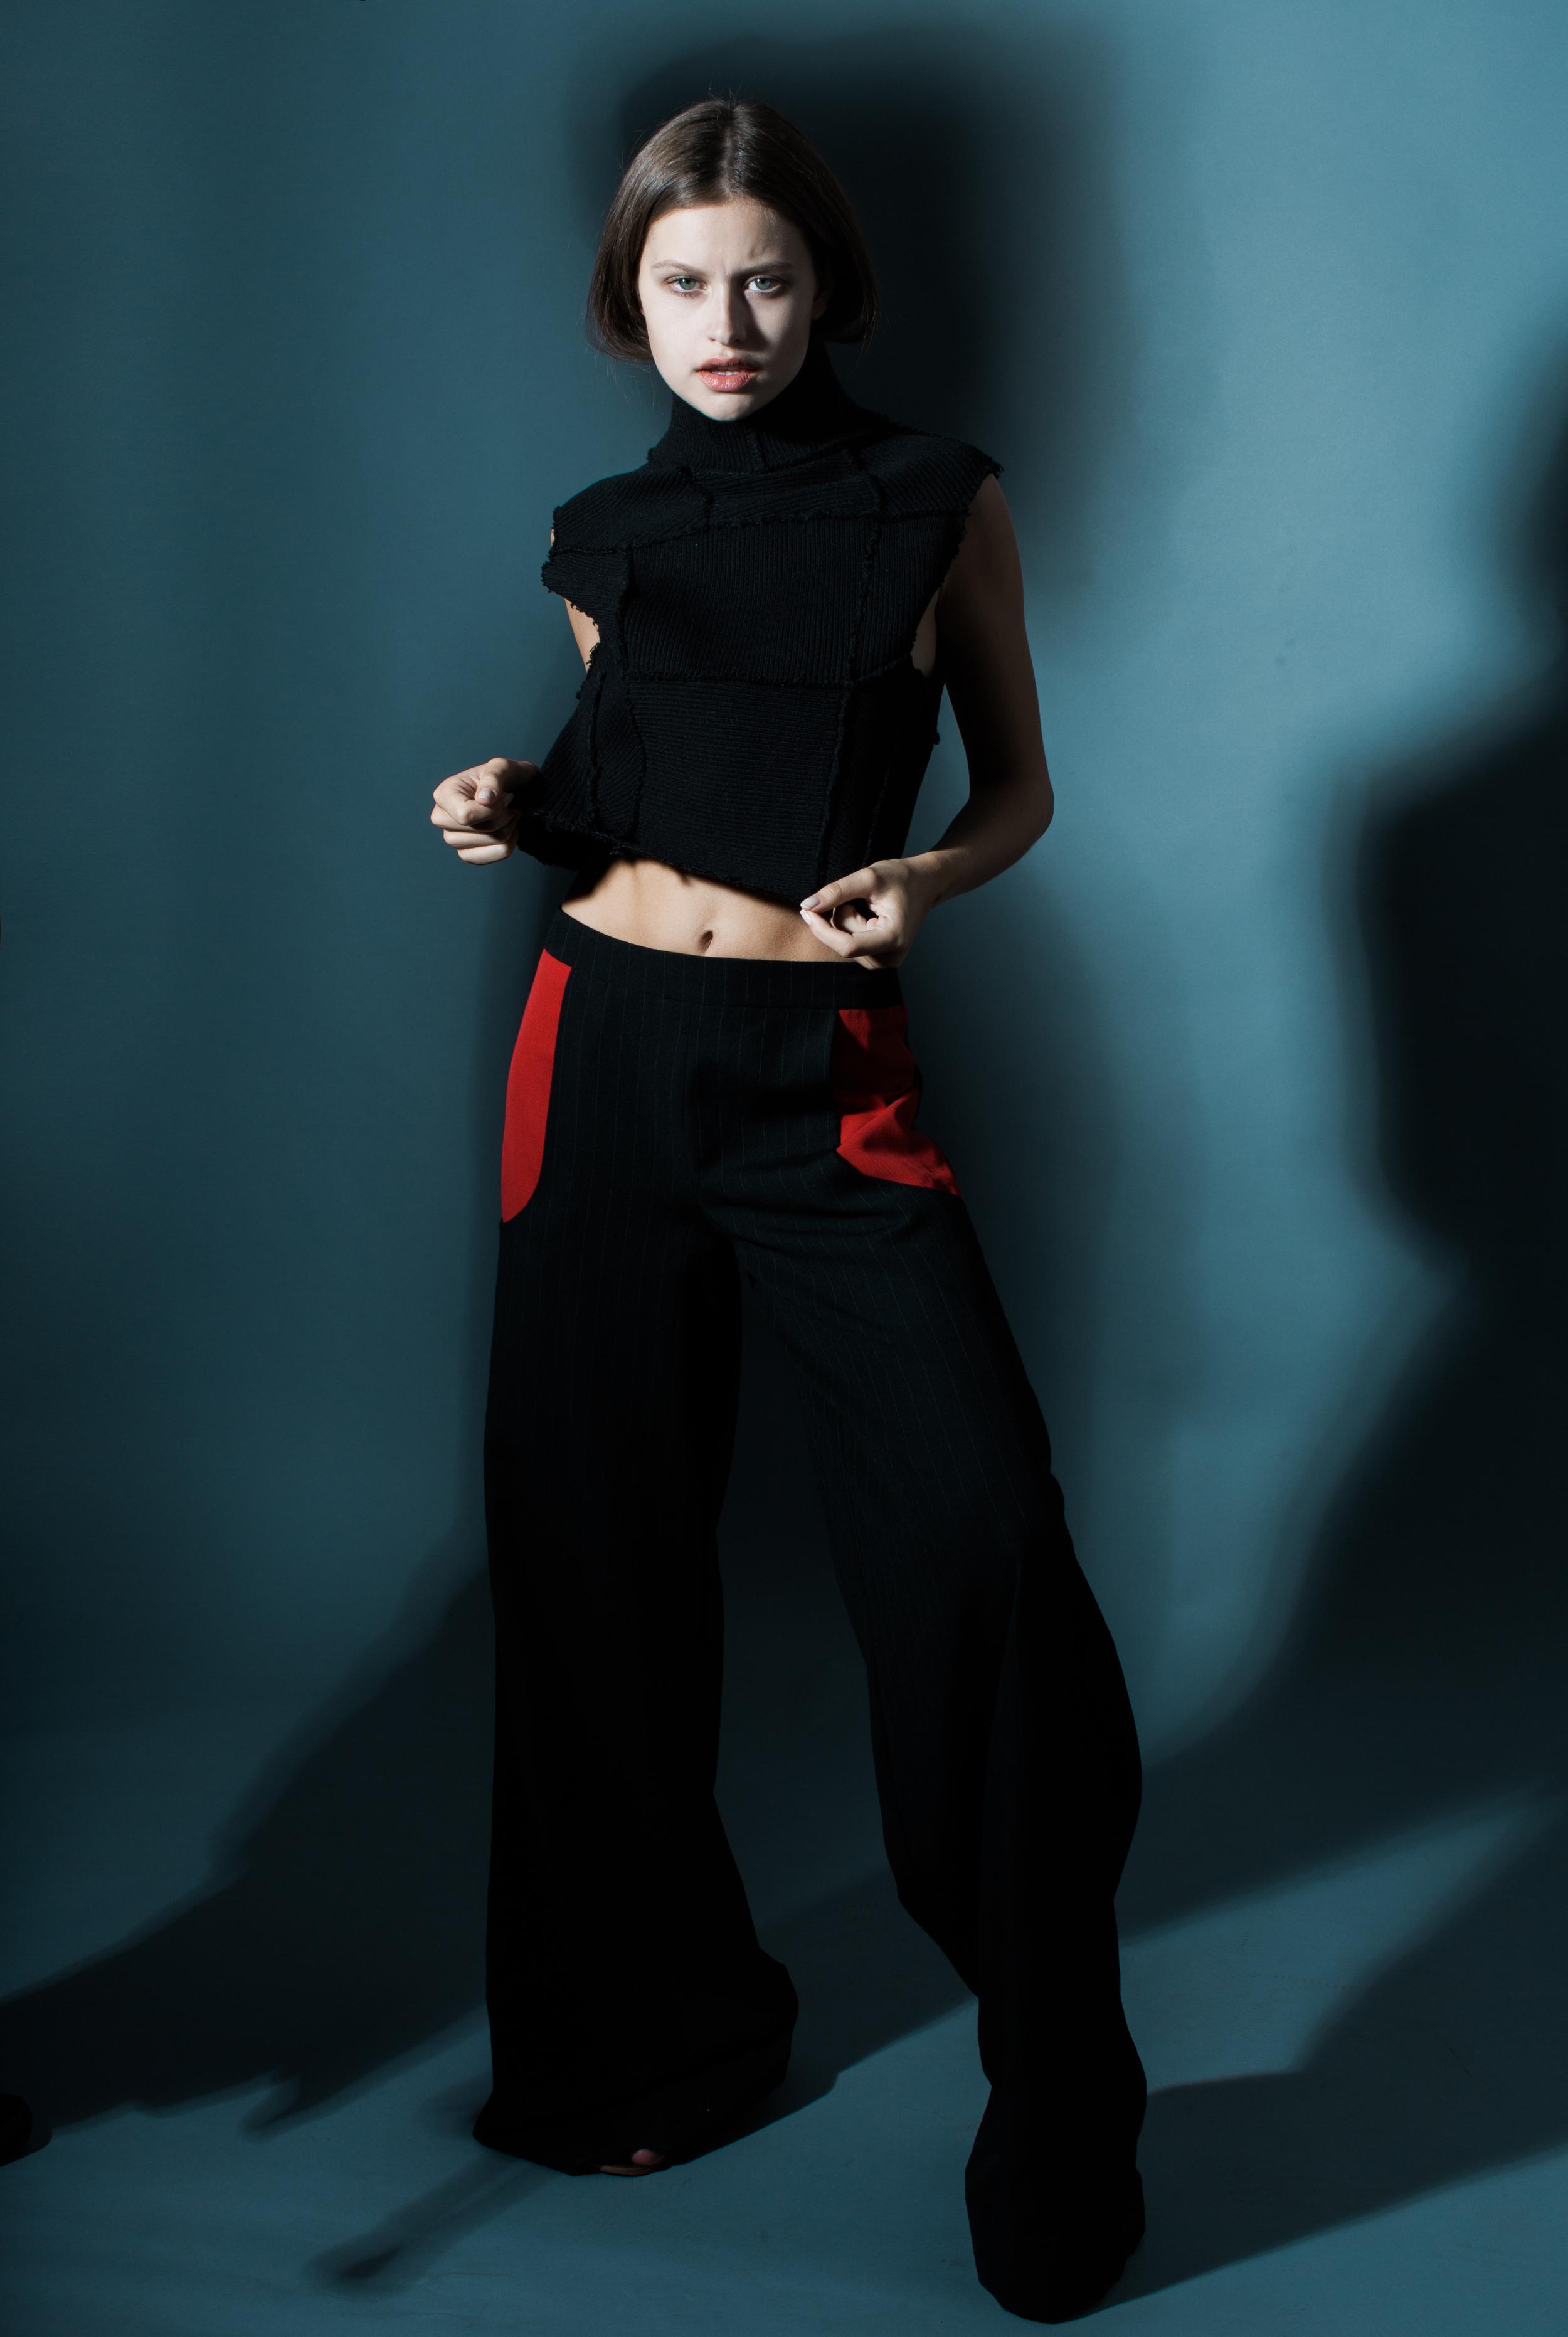 model LEXI WOOD   photographer BONNIE NICHOALDS   featured designer  XJAFINE   styled by NIK